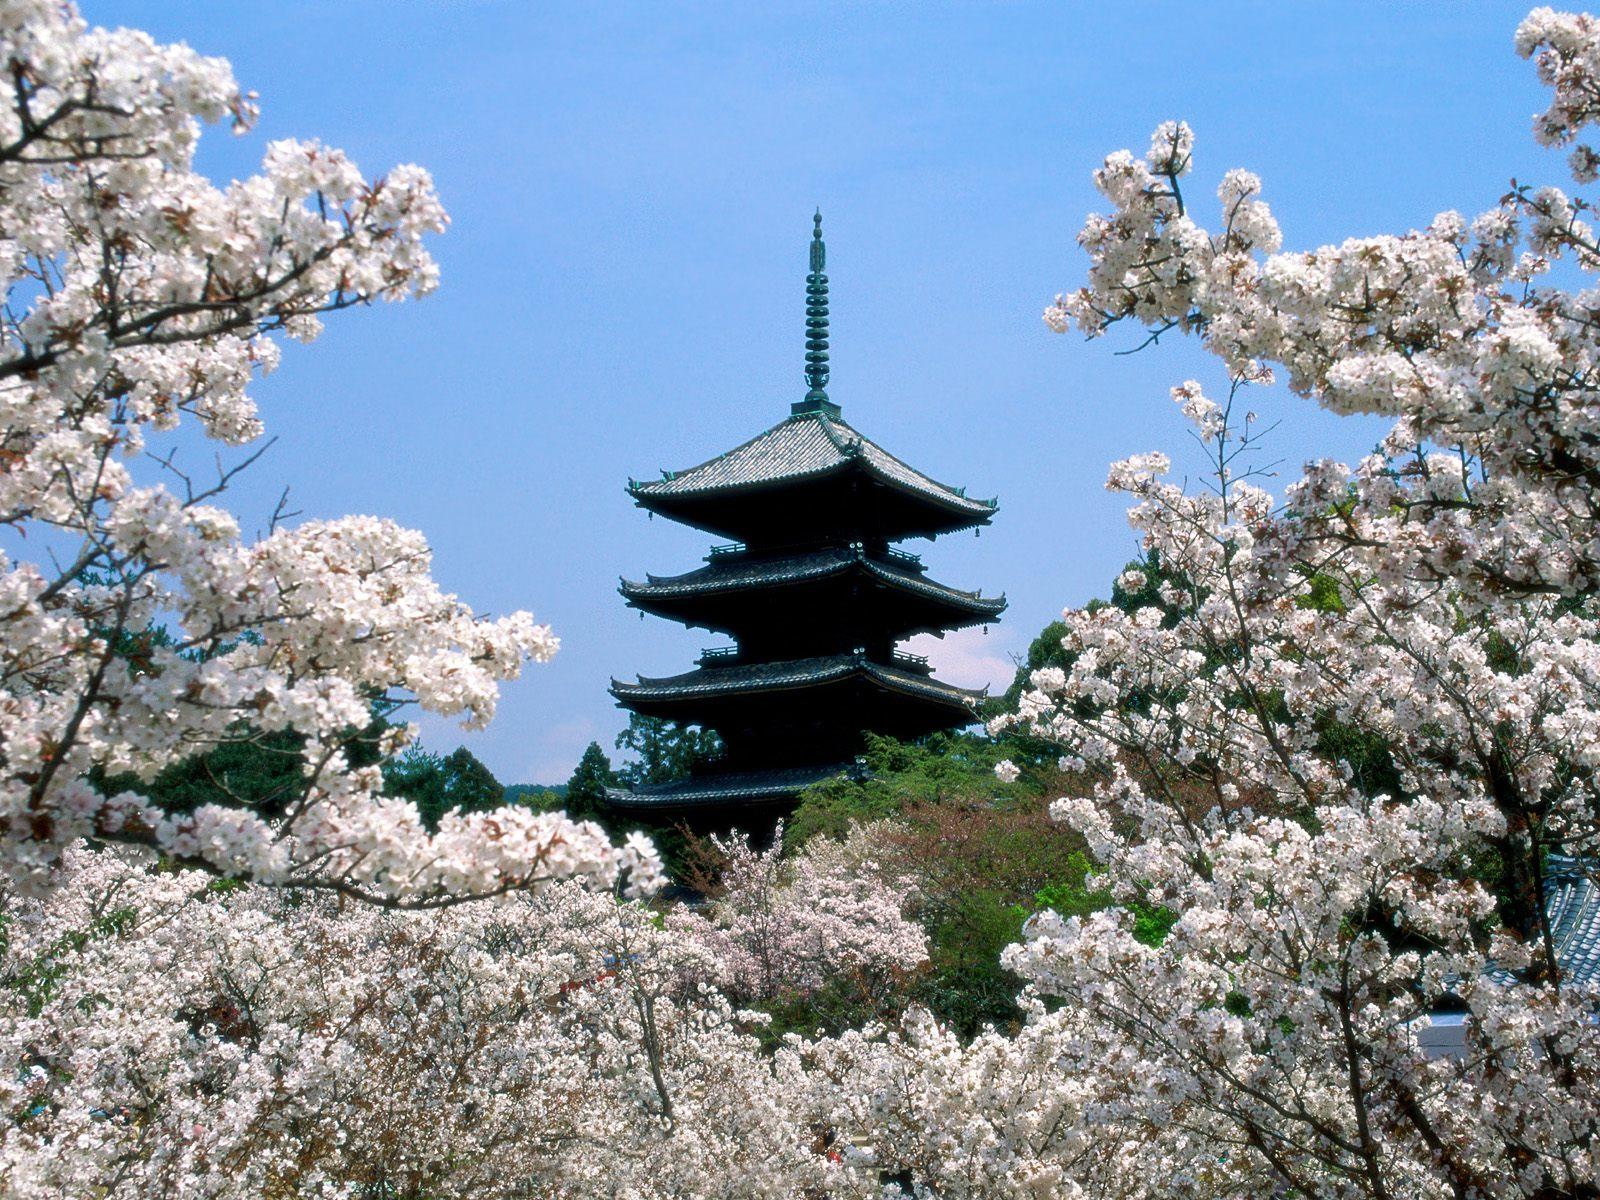 http://1.bp.blogspot.com/_708_wIdtSh0/S_5iOC60CKI/AAAAAAAABEQ/_M6DJCxmxzo/s1600/Cherry+Blossoms,+Ninna-Ji+Temple+Grounds,+Kyoto,+Japan.jpg